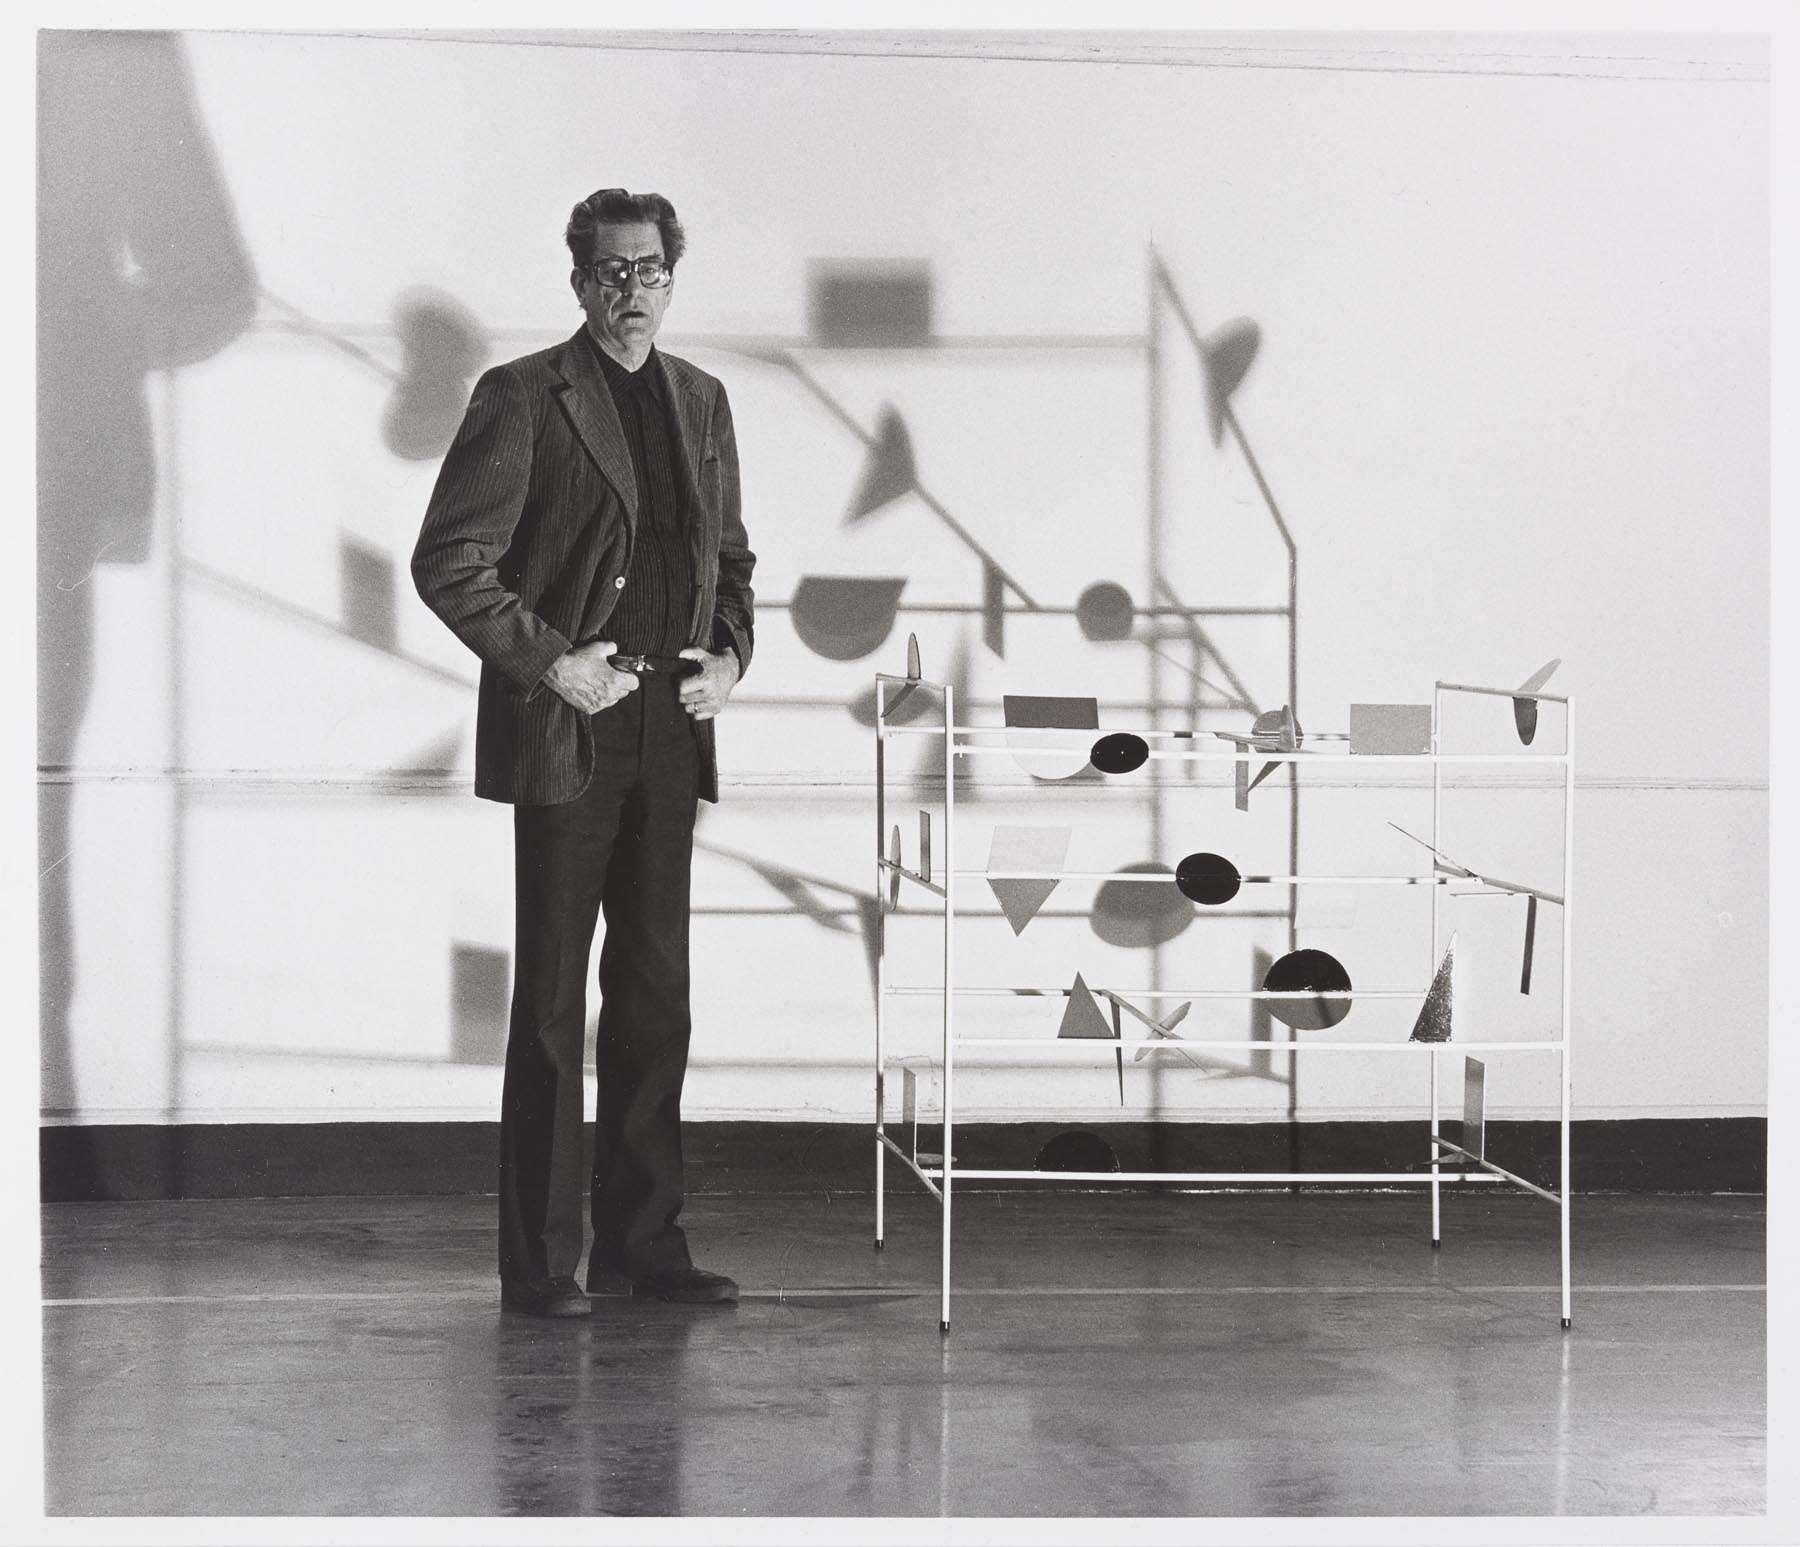 Ernst Mether-Borgström, EMB -säätiön arkisto, kuva: Yehia Eweis / EMMA